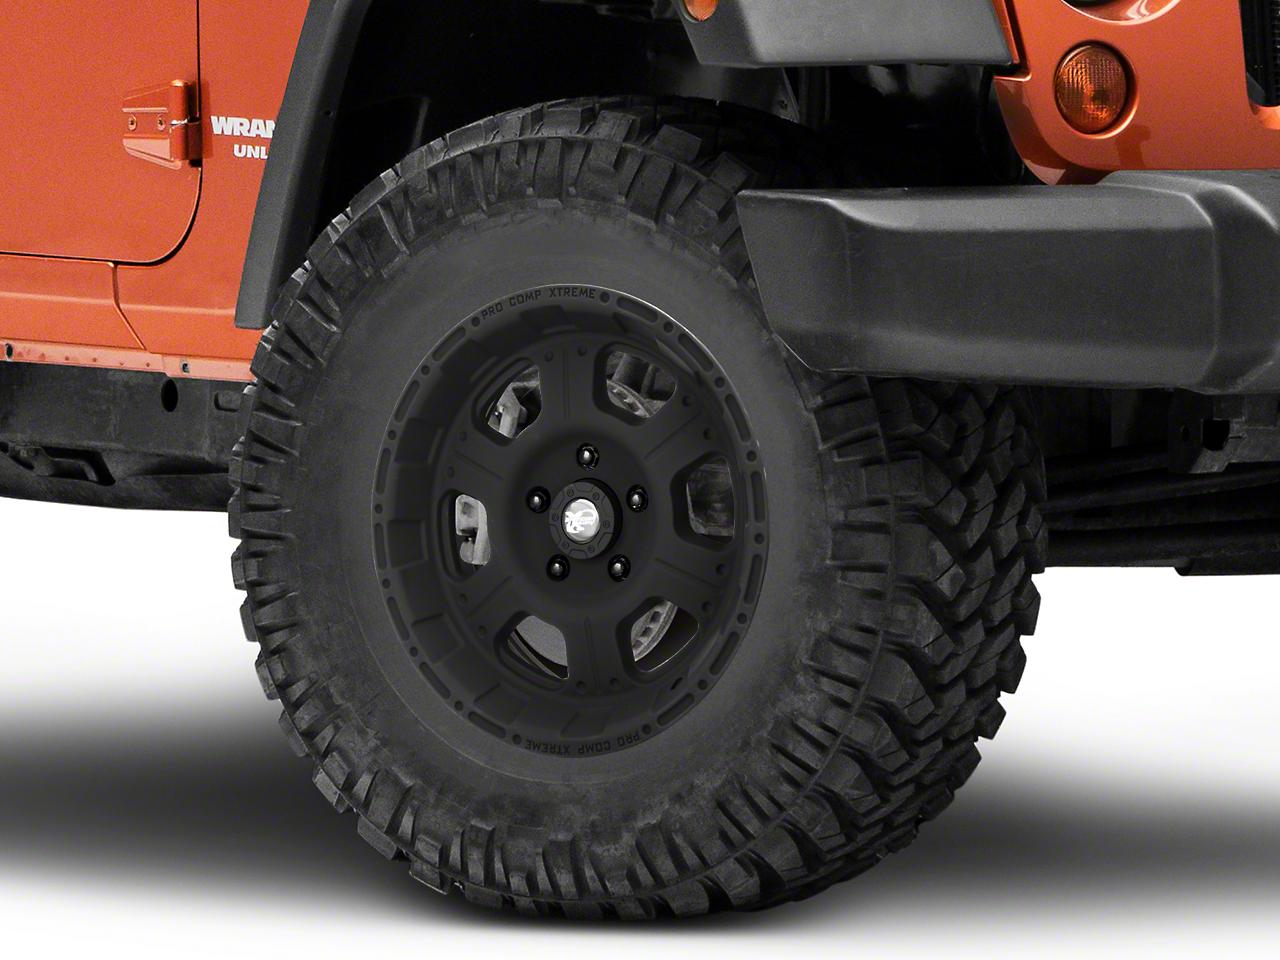 Pro Comp Alloy Series 7089 Flat Black Wheel - 17x8 (07-18 Jeep Wrangler JK; 2018 Jeep Wrangler JL)